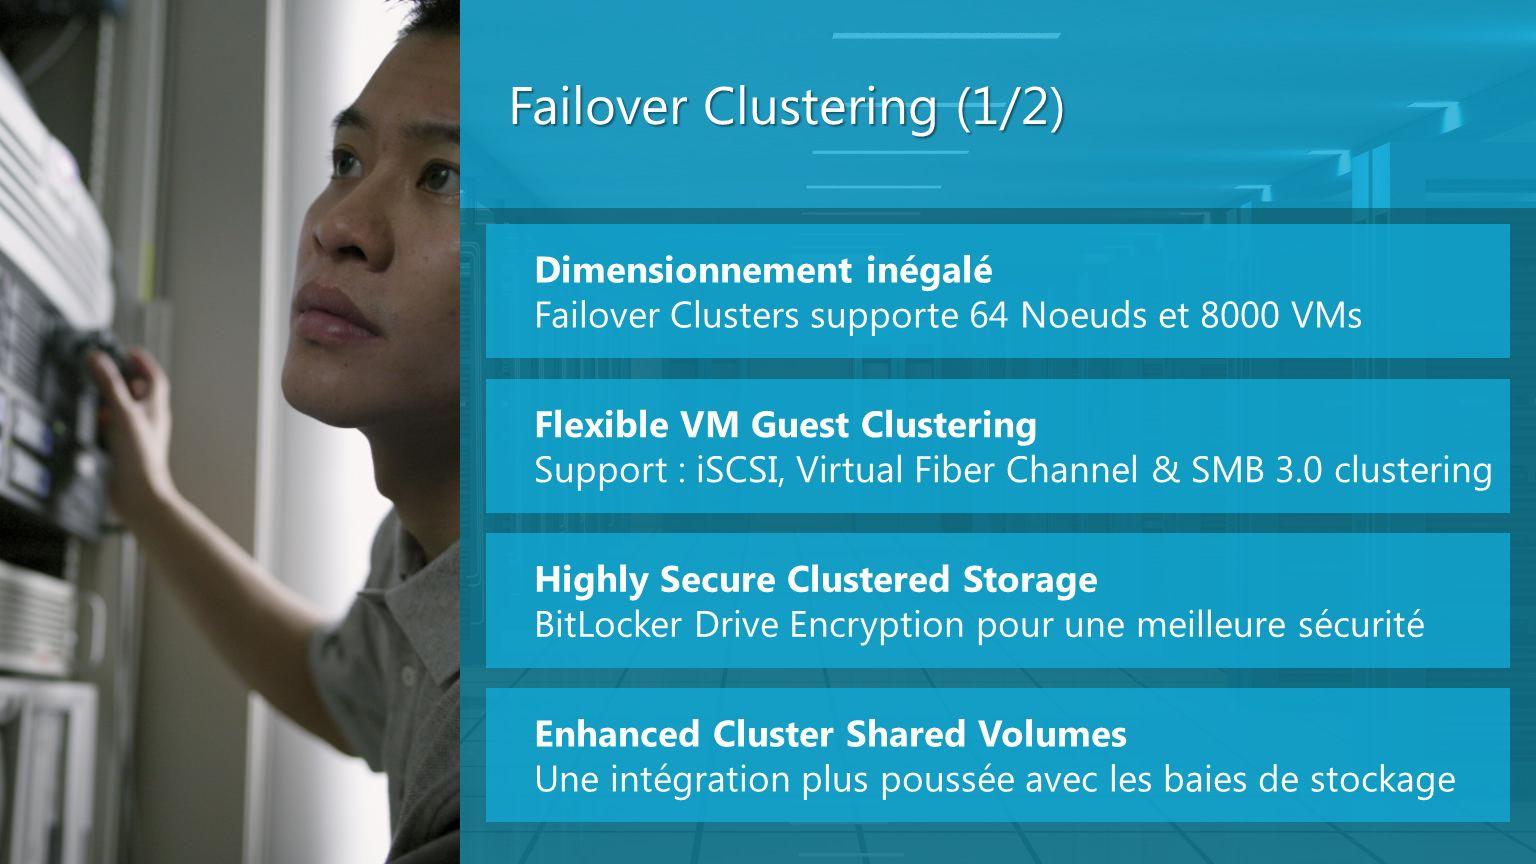 Failover Clustering (1/2) Dimensionnement inégalé Failover Clusters supporte 64 Noeuds et 8000 VMs Flexible VM Guest Clustering Support : iSCSI, Virtu